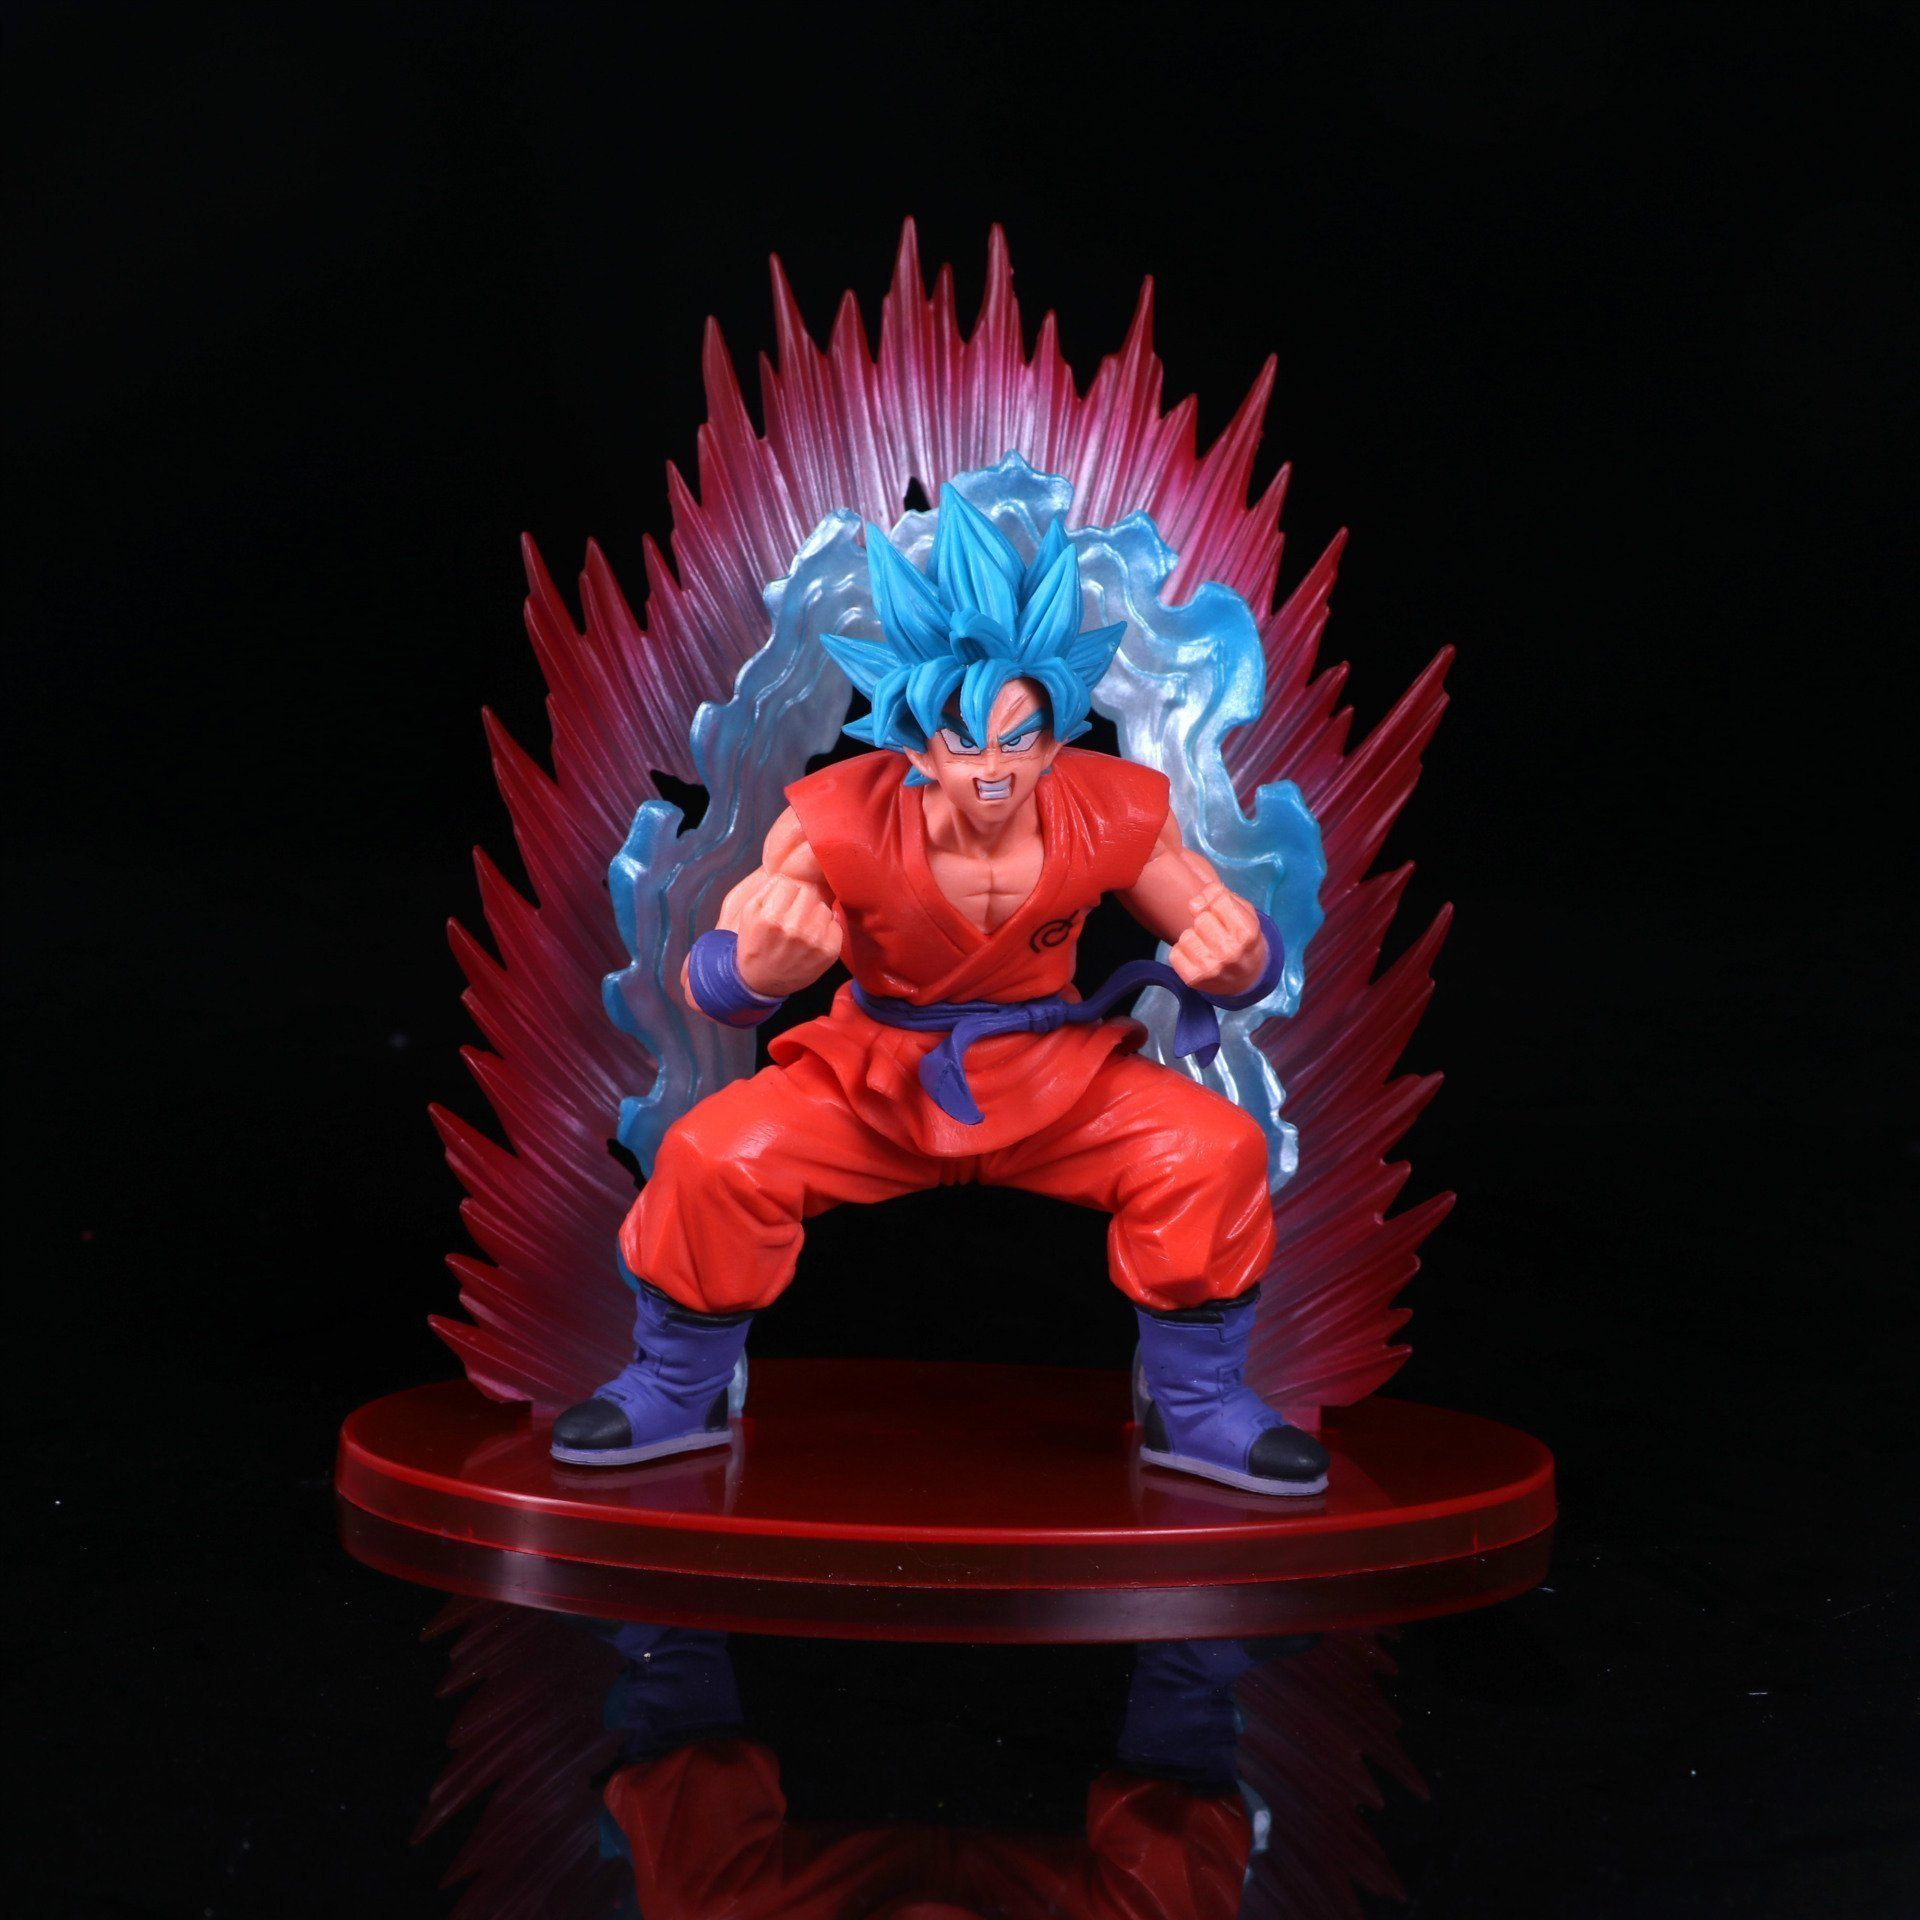 Dragon Ball Z Figure Super Saiyan God Kaiouken Goku Blue Hair Statue Toy Comic Anime Act Anime Dragon Ball Super Action Figures Hot Toys Dragon Ball Super